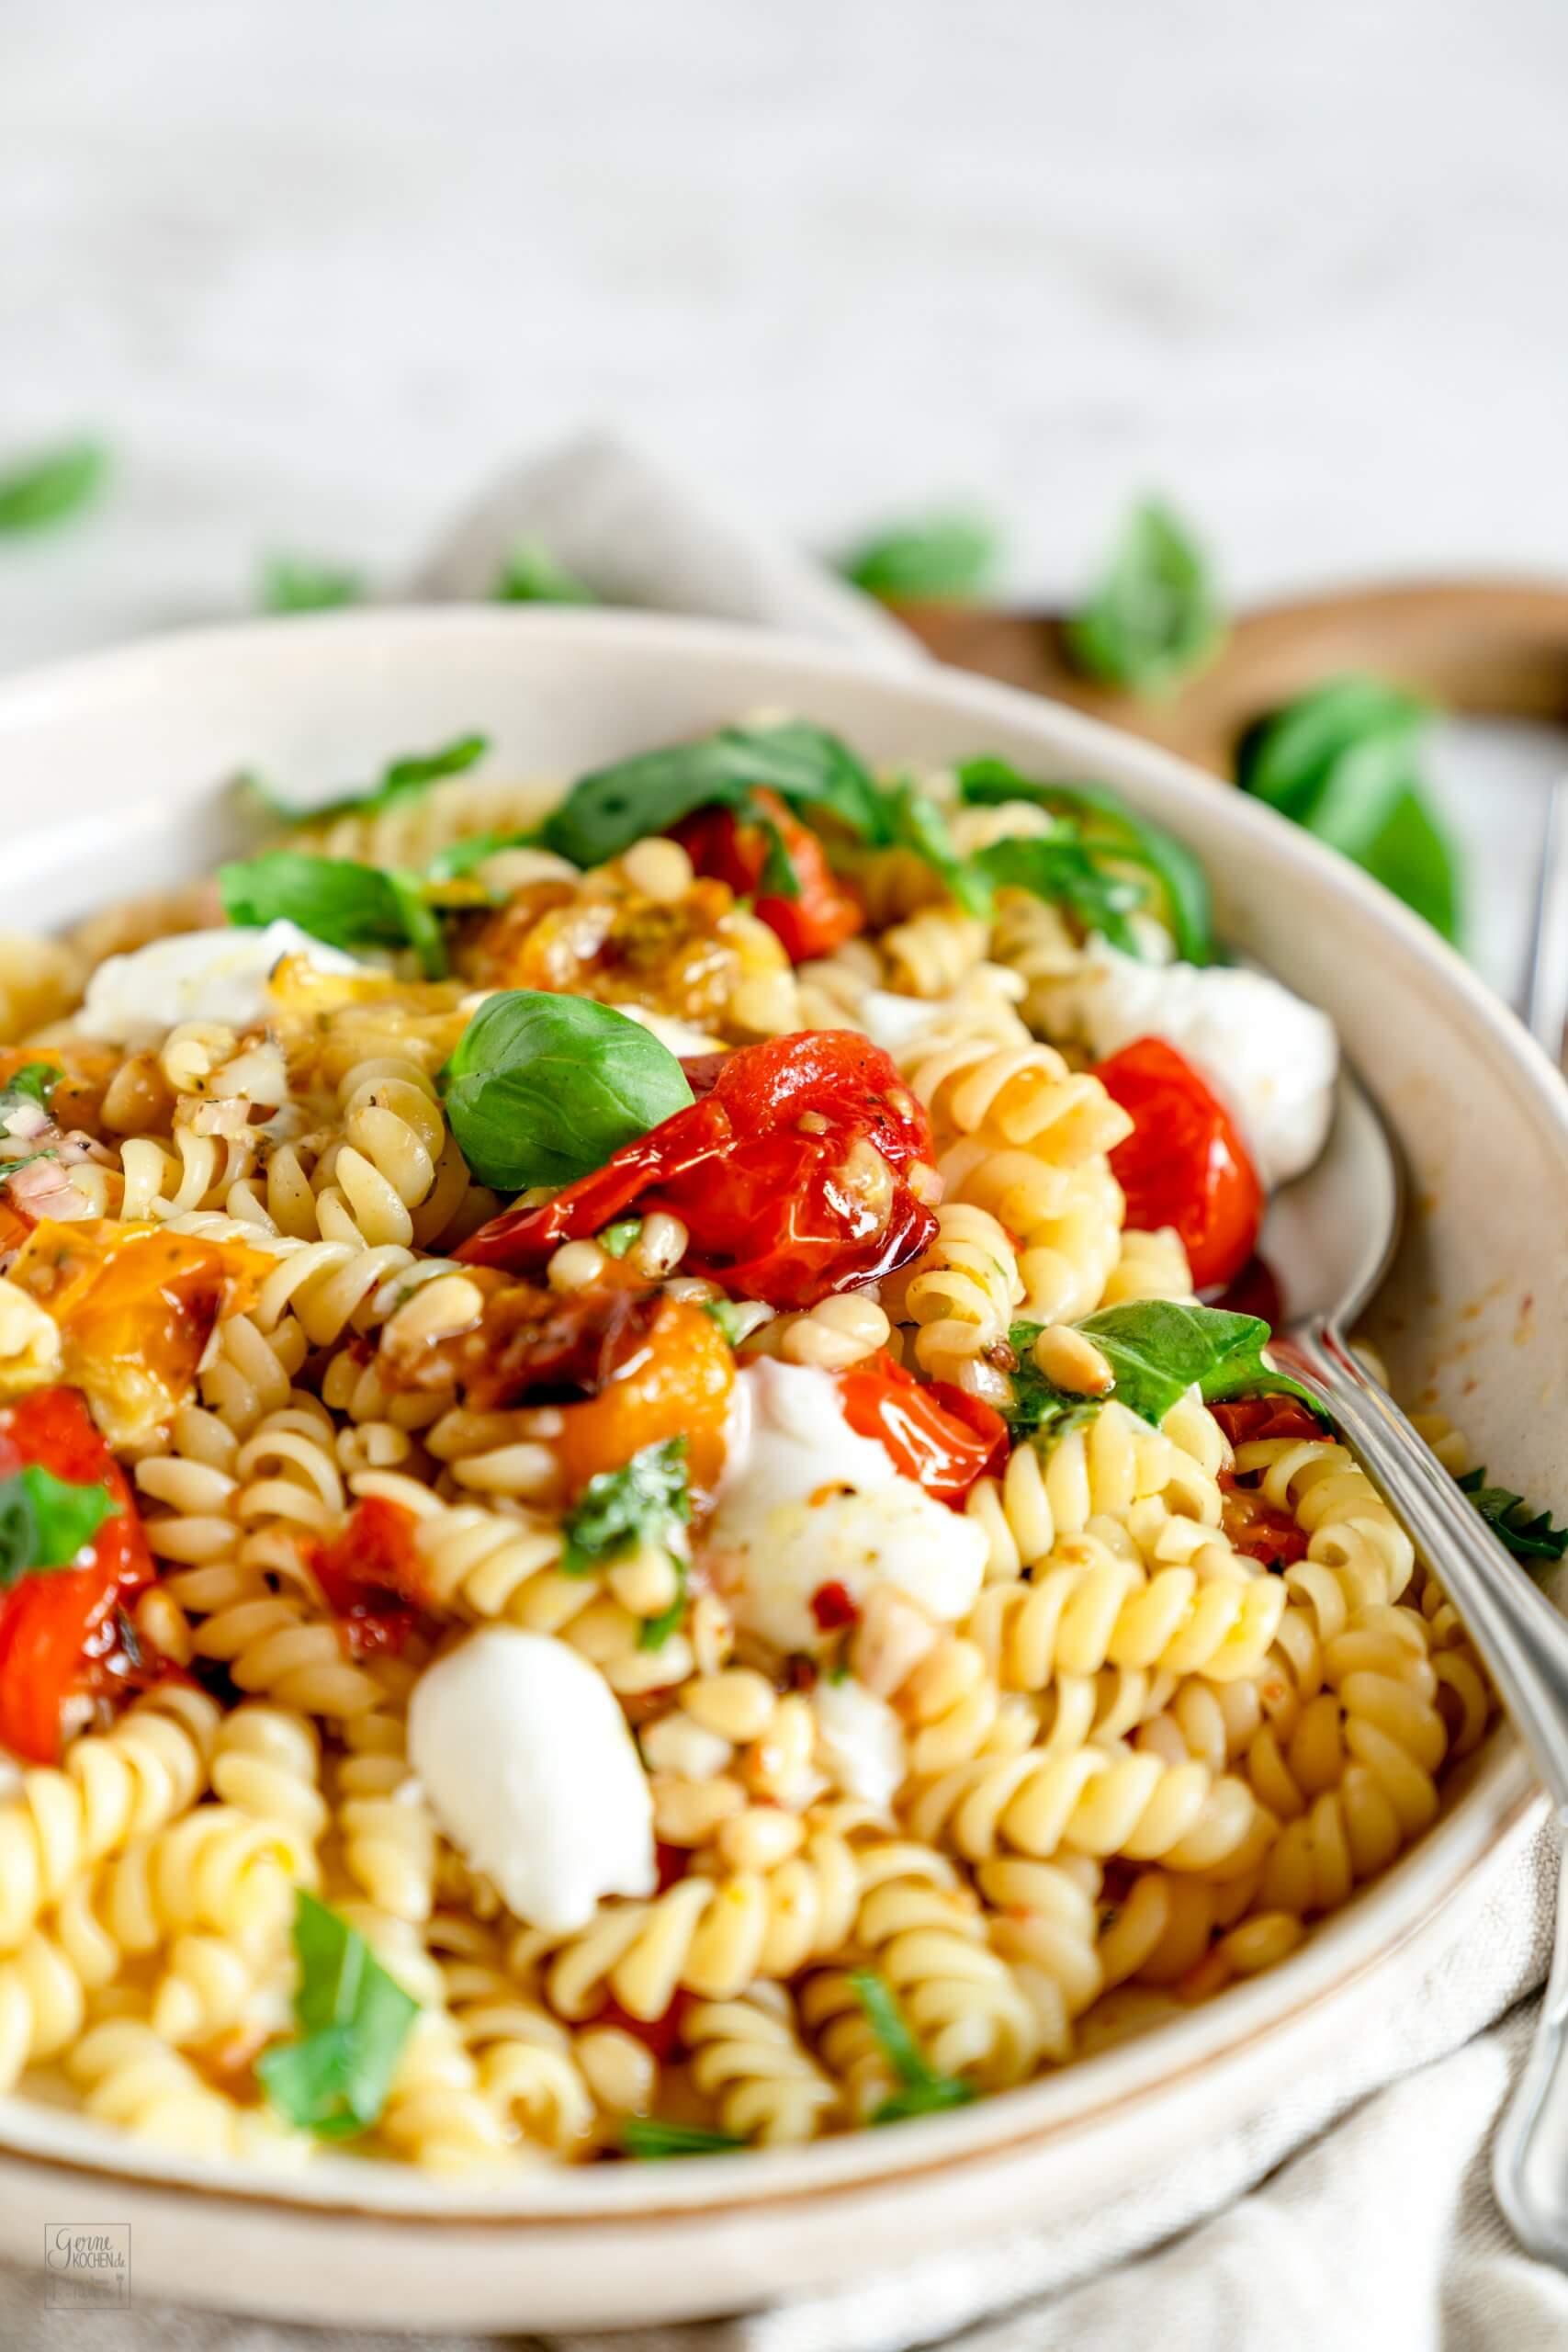 Pasta mit ofengerösteten Tomaten und Mozzarella